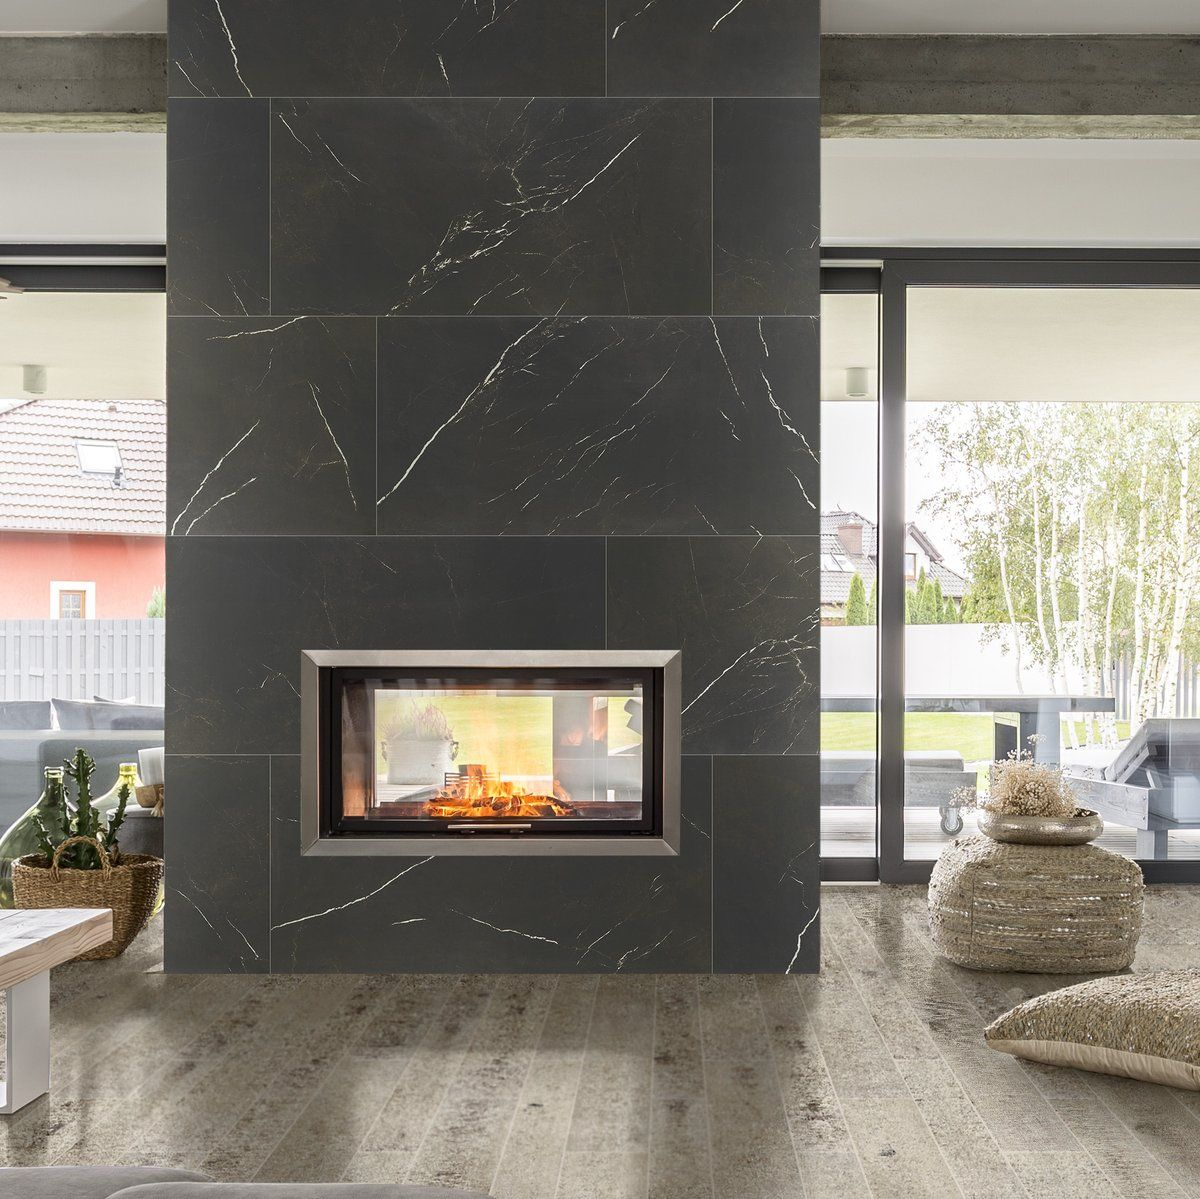 Image Result For Large Format Tile Fireplace Fireplace Remodel